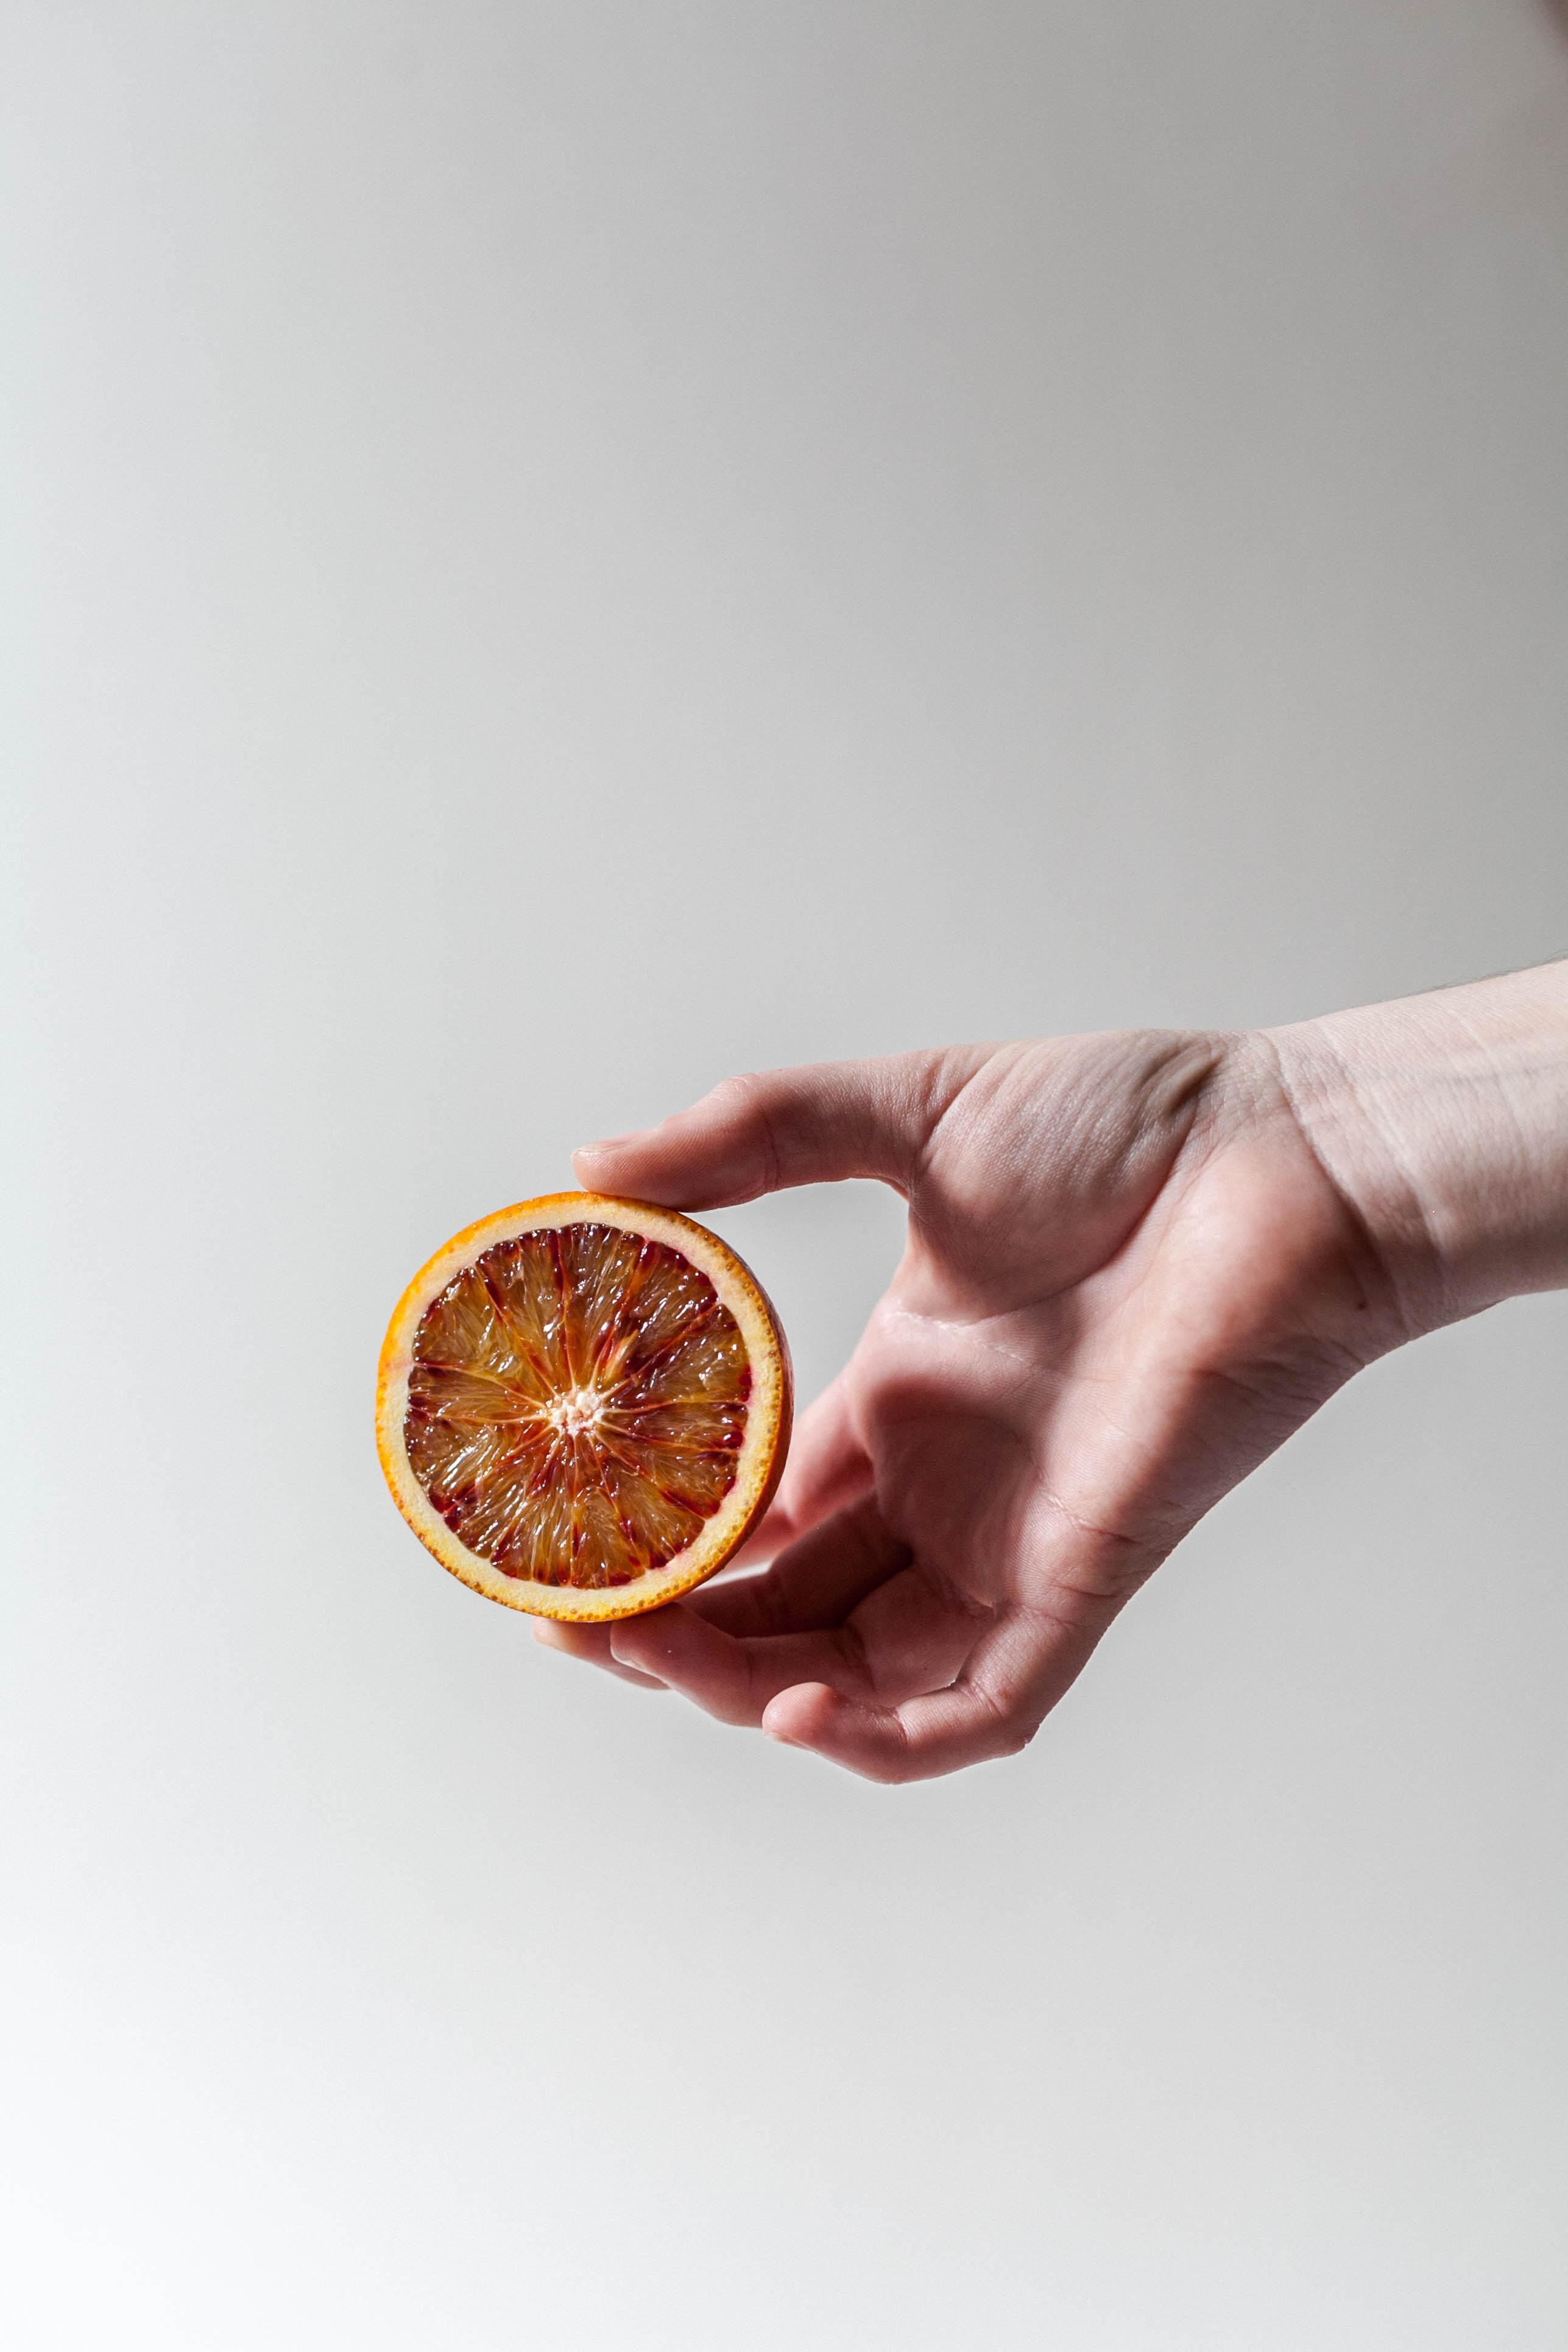 person holding sliced grapefruit